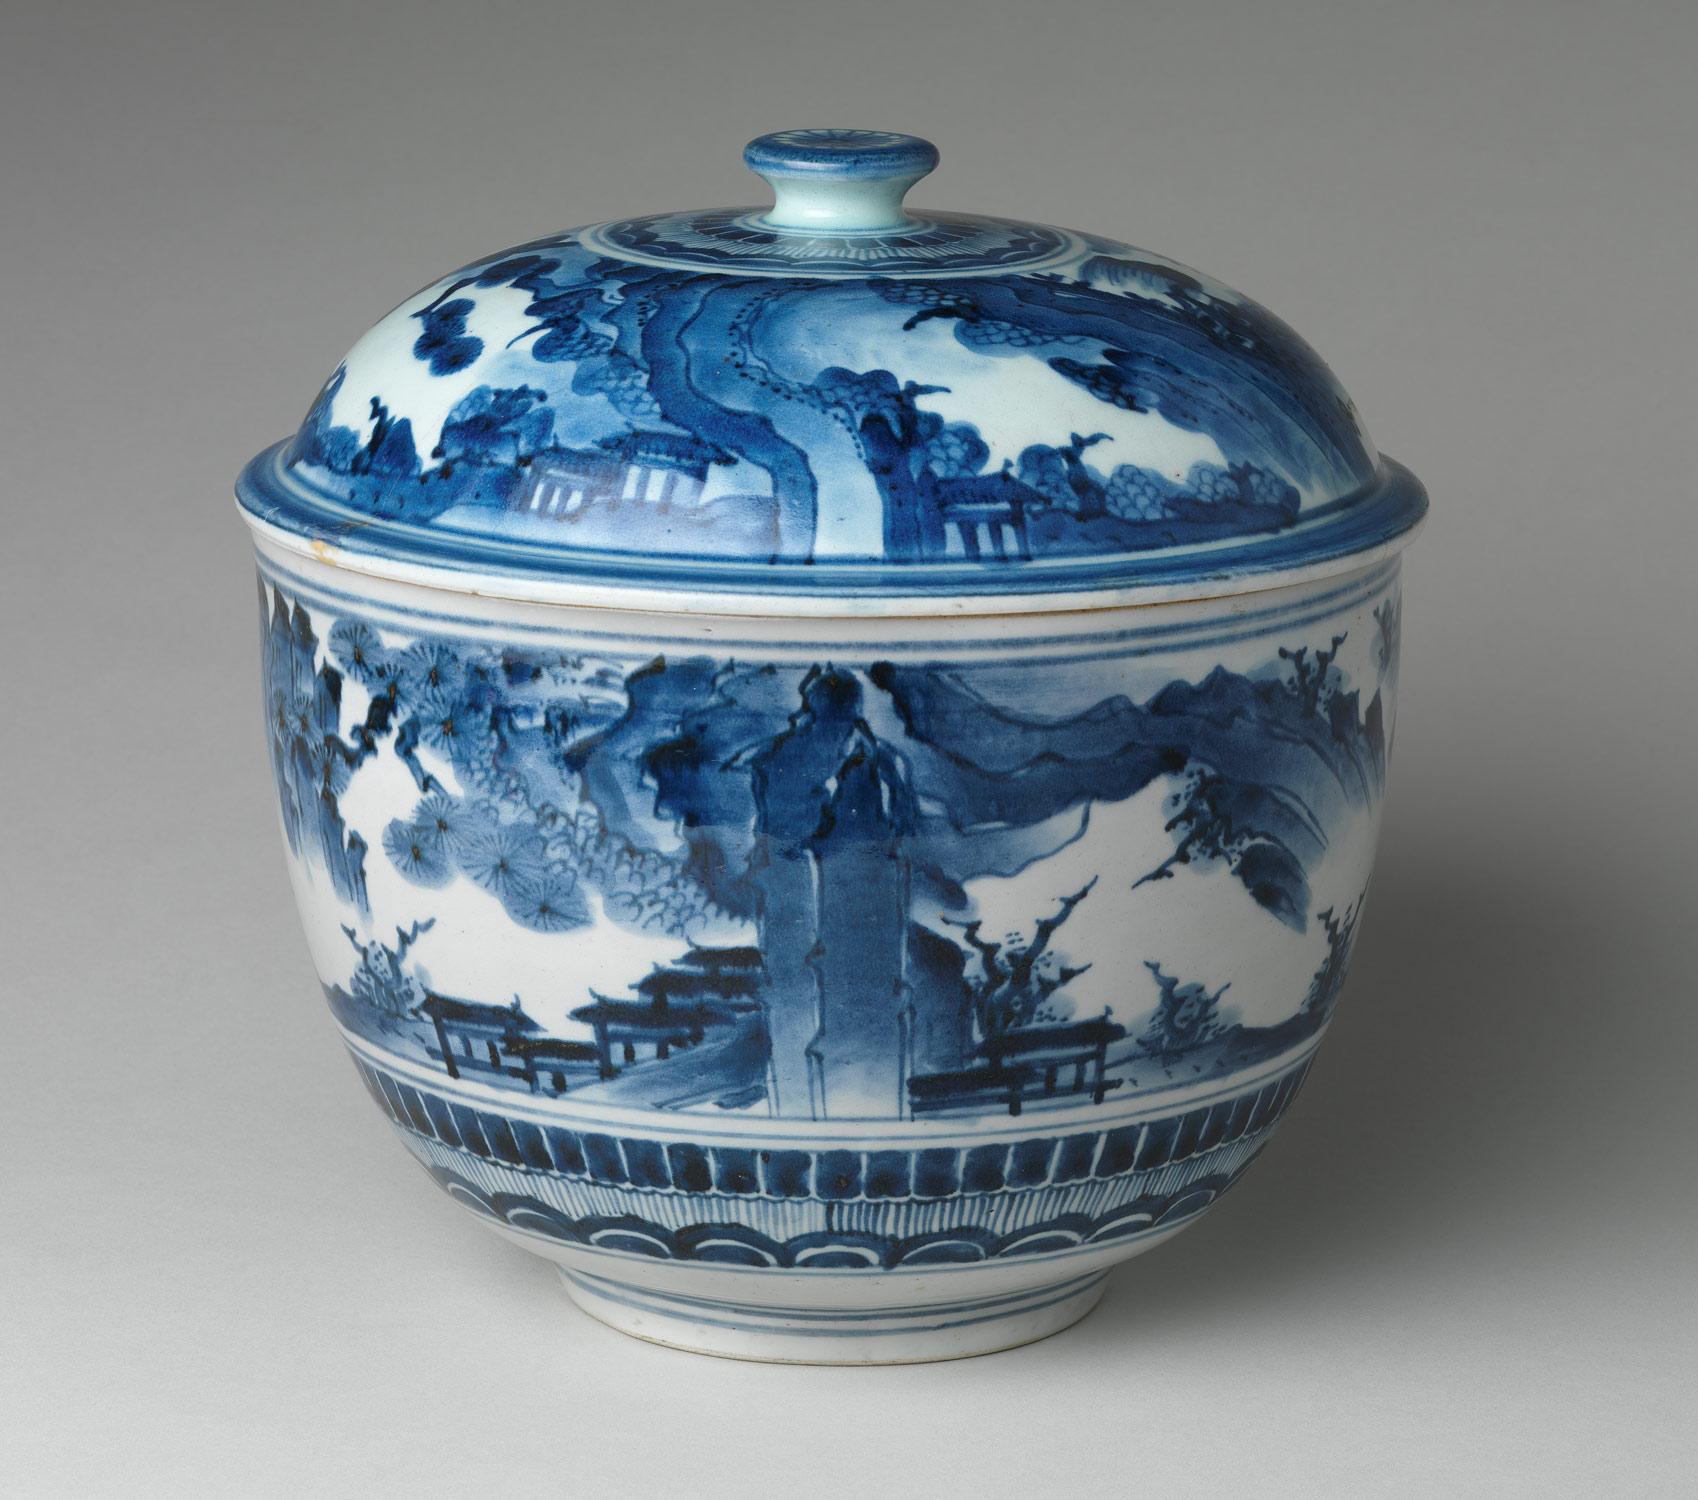 Edo period japanese porcelain essay heilbrunn timeline of art tureen with landscape reviewsmspy